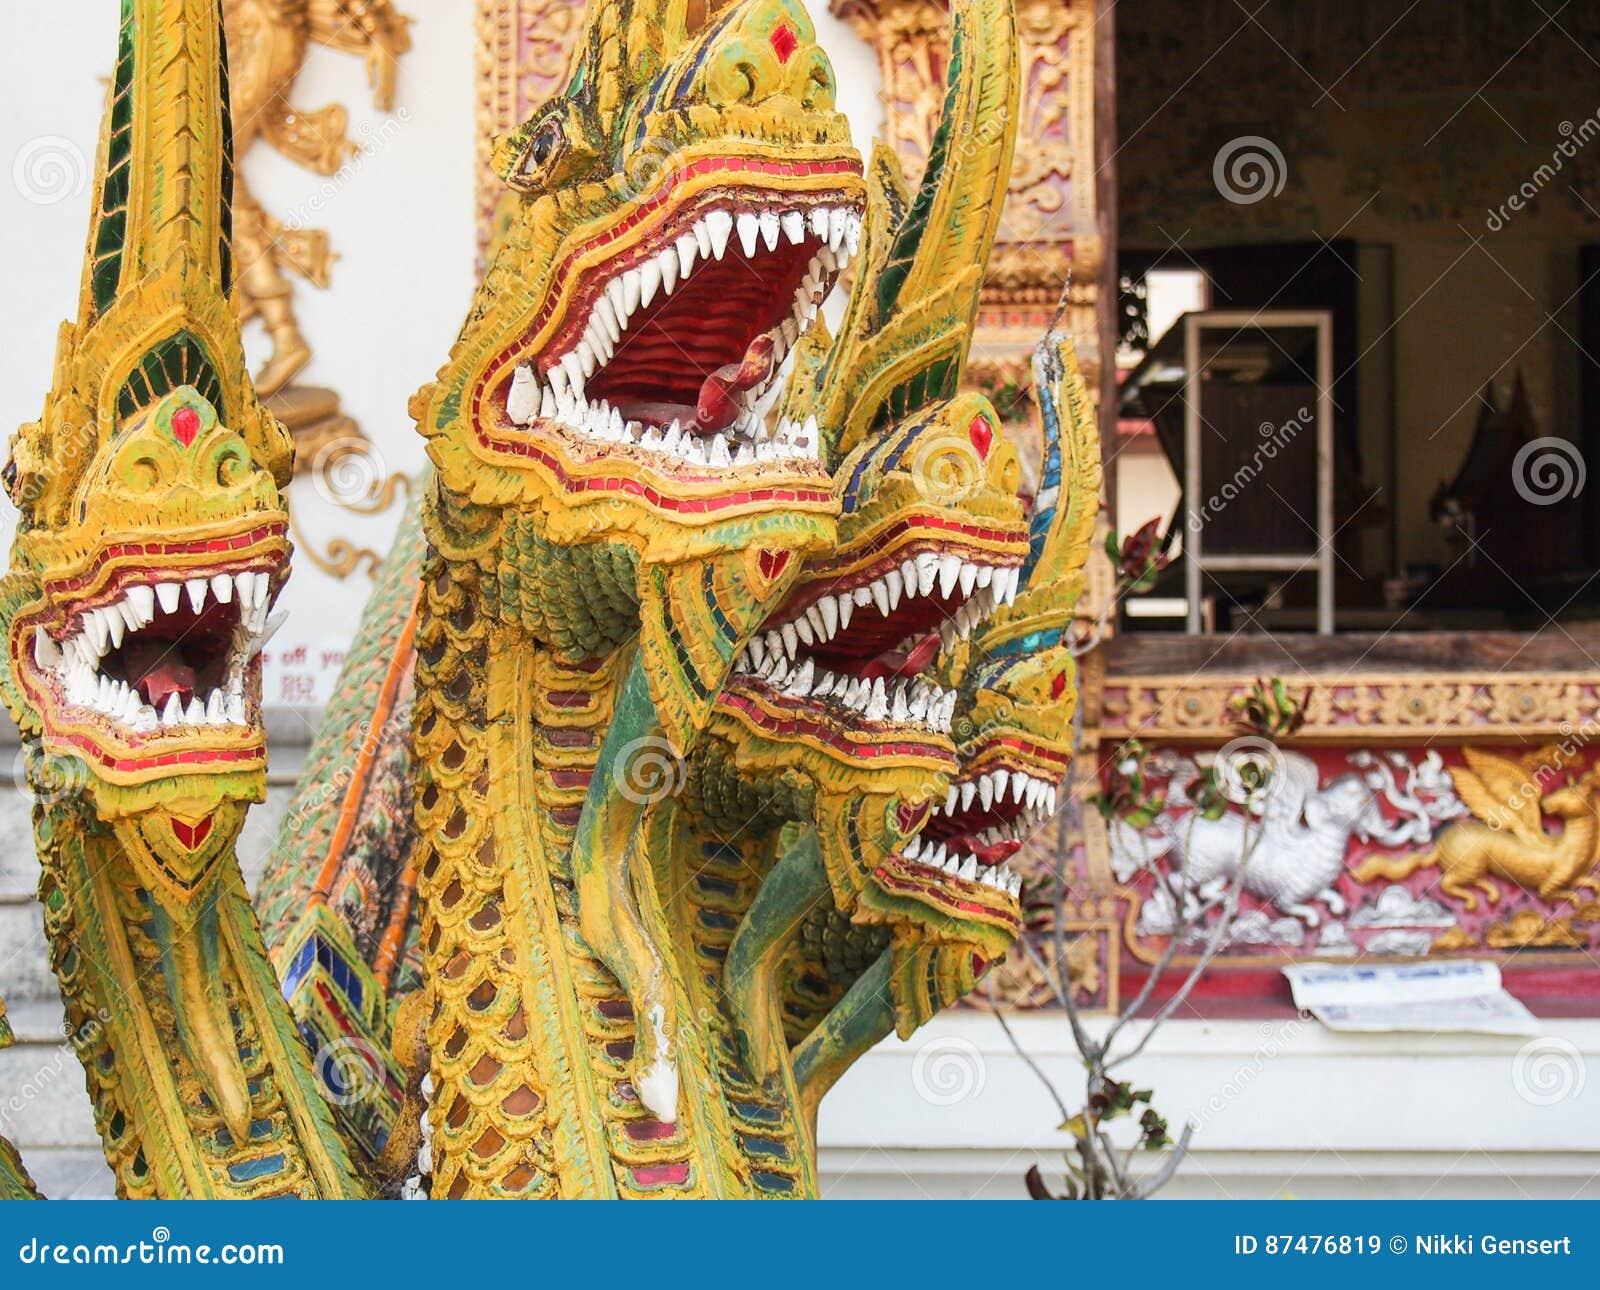 Скульптура дракона на виске в Чиангмае Таиланде